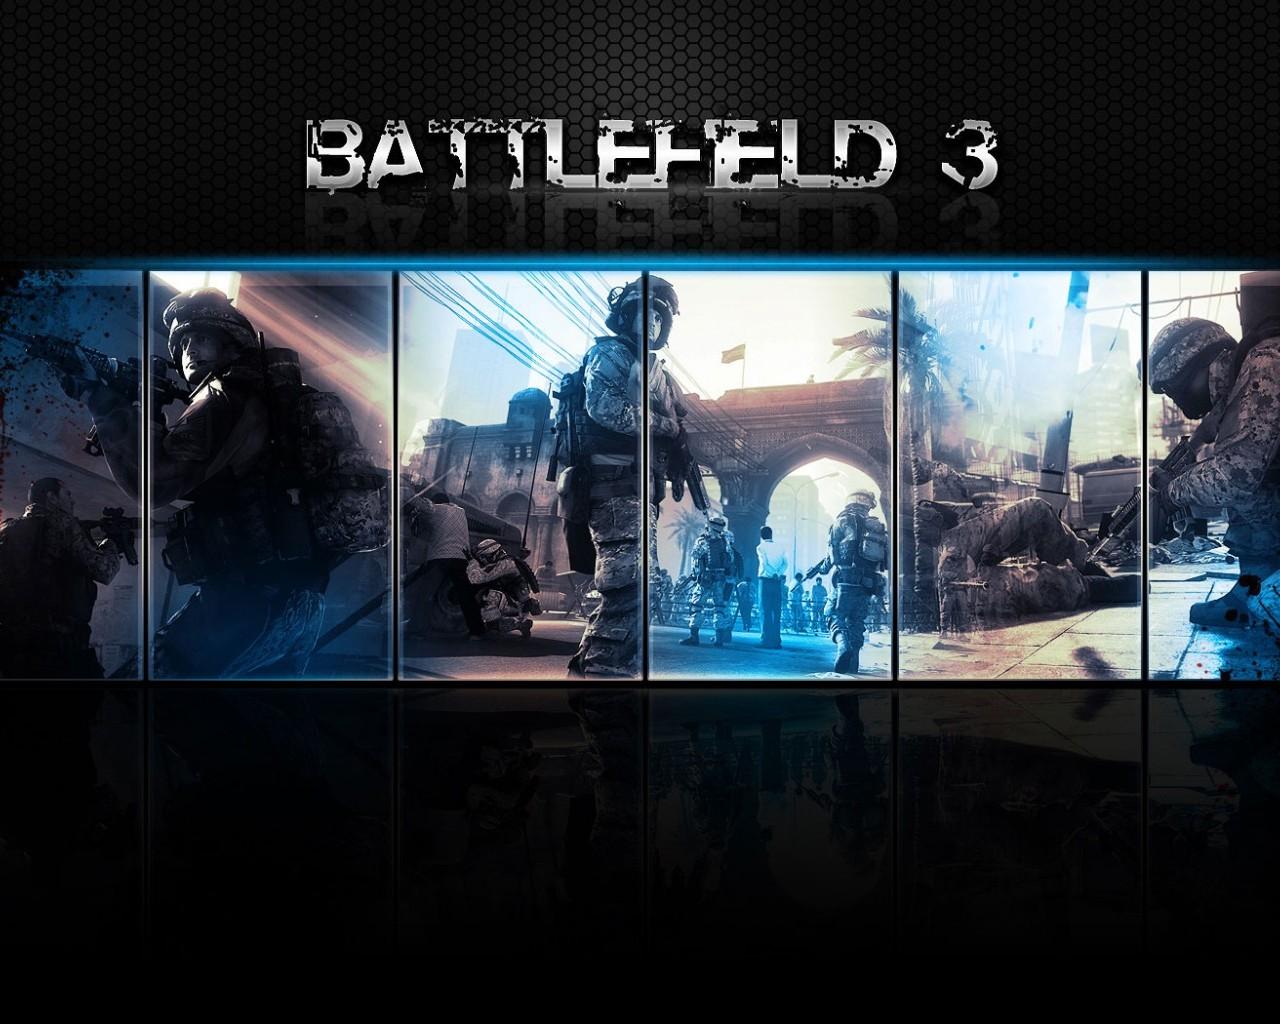 http://2.bp.blogspot.com/-UkTpgXg7XEk/ToUPywkTywI/AAAAAAAAAI8/eGVt-O3onoA/s1600/Battlefield+3+1280x1024.jpg